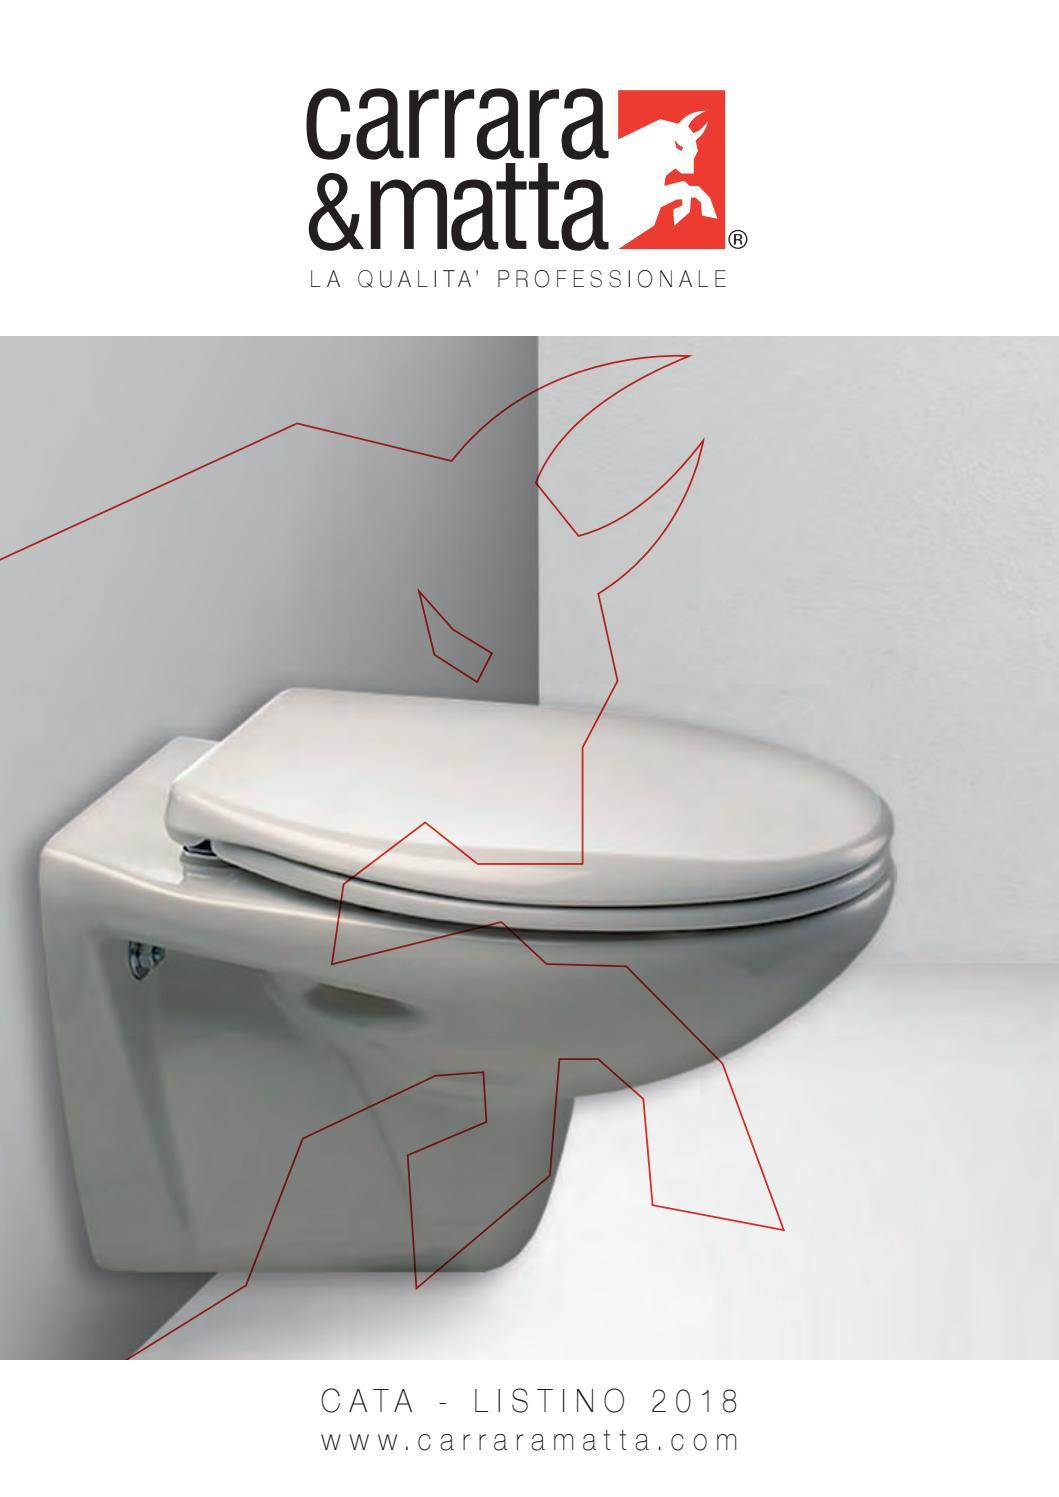 hot sale online 5df93 c10a9 2018 Carrara & Matta Catalogo - Italia by BemisEMEA - issuu